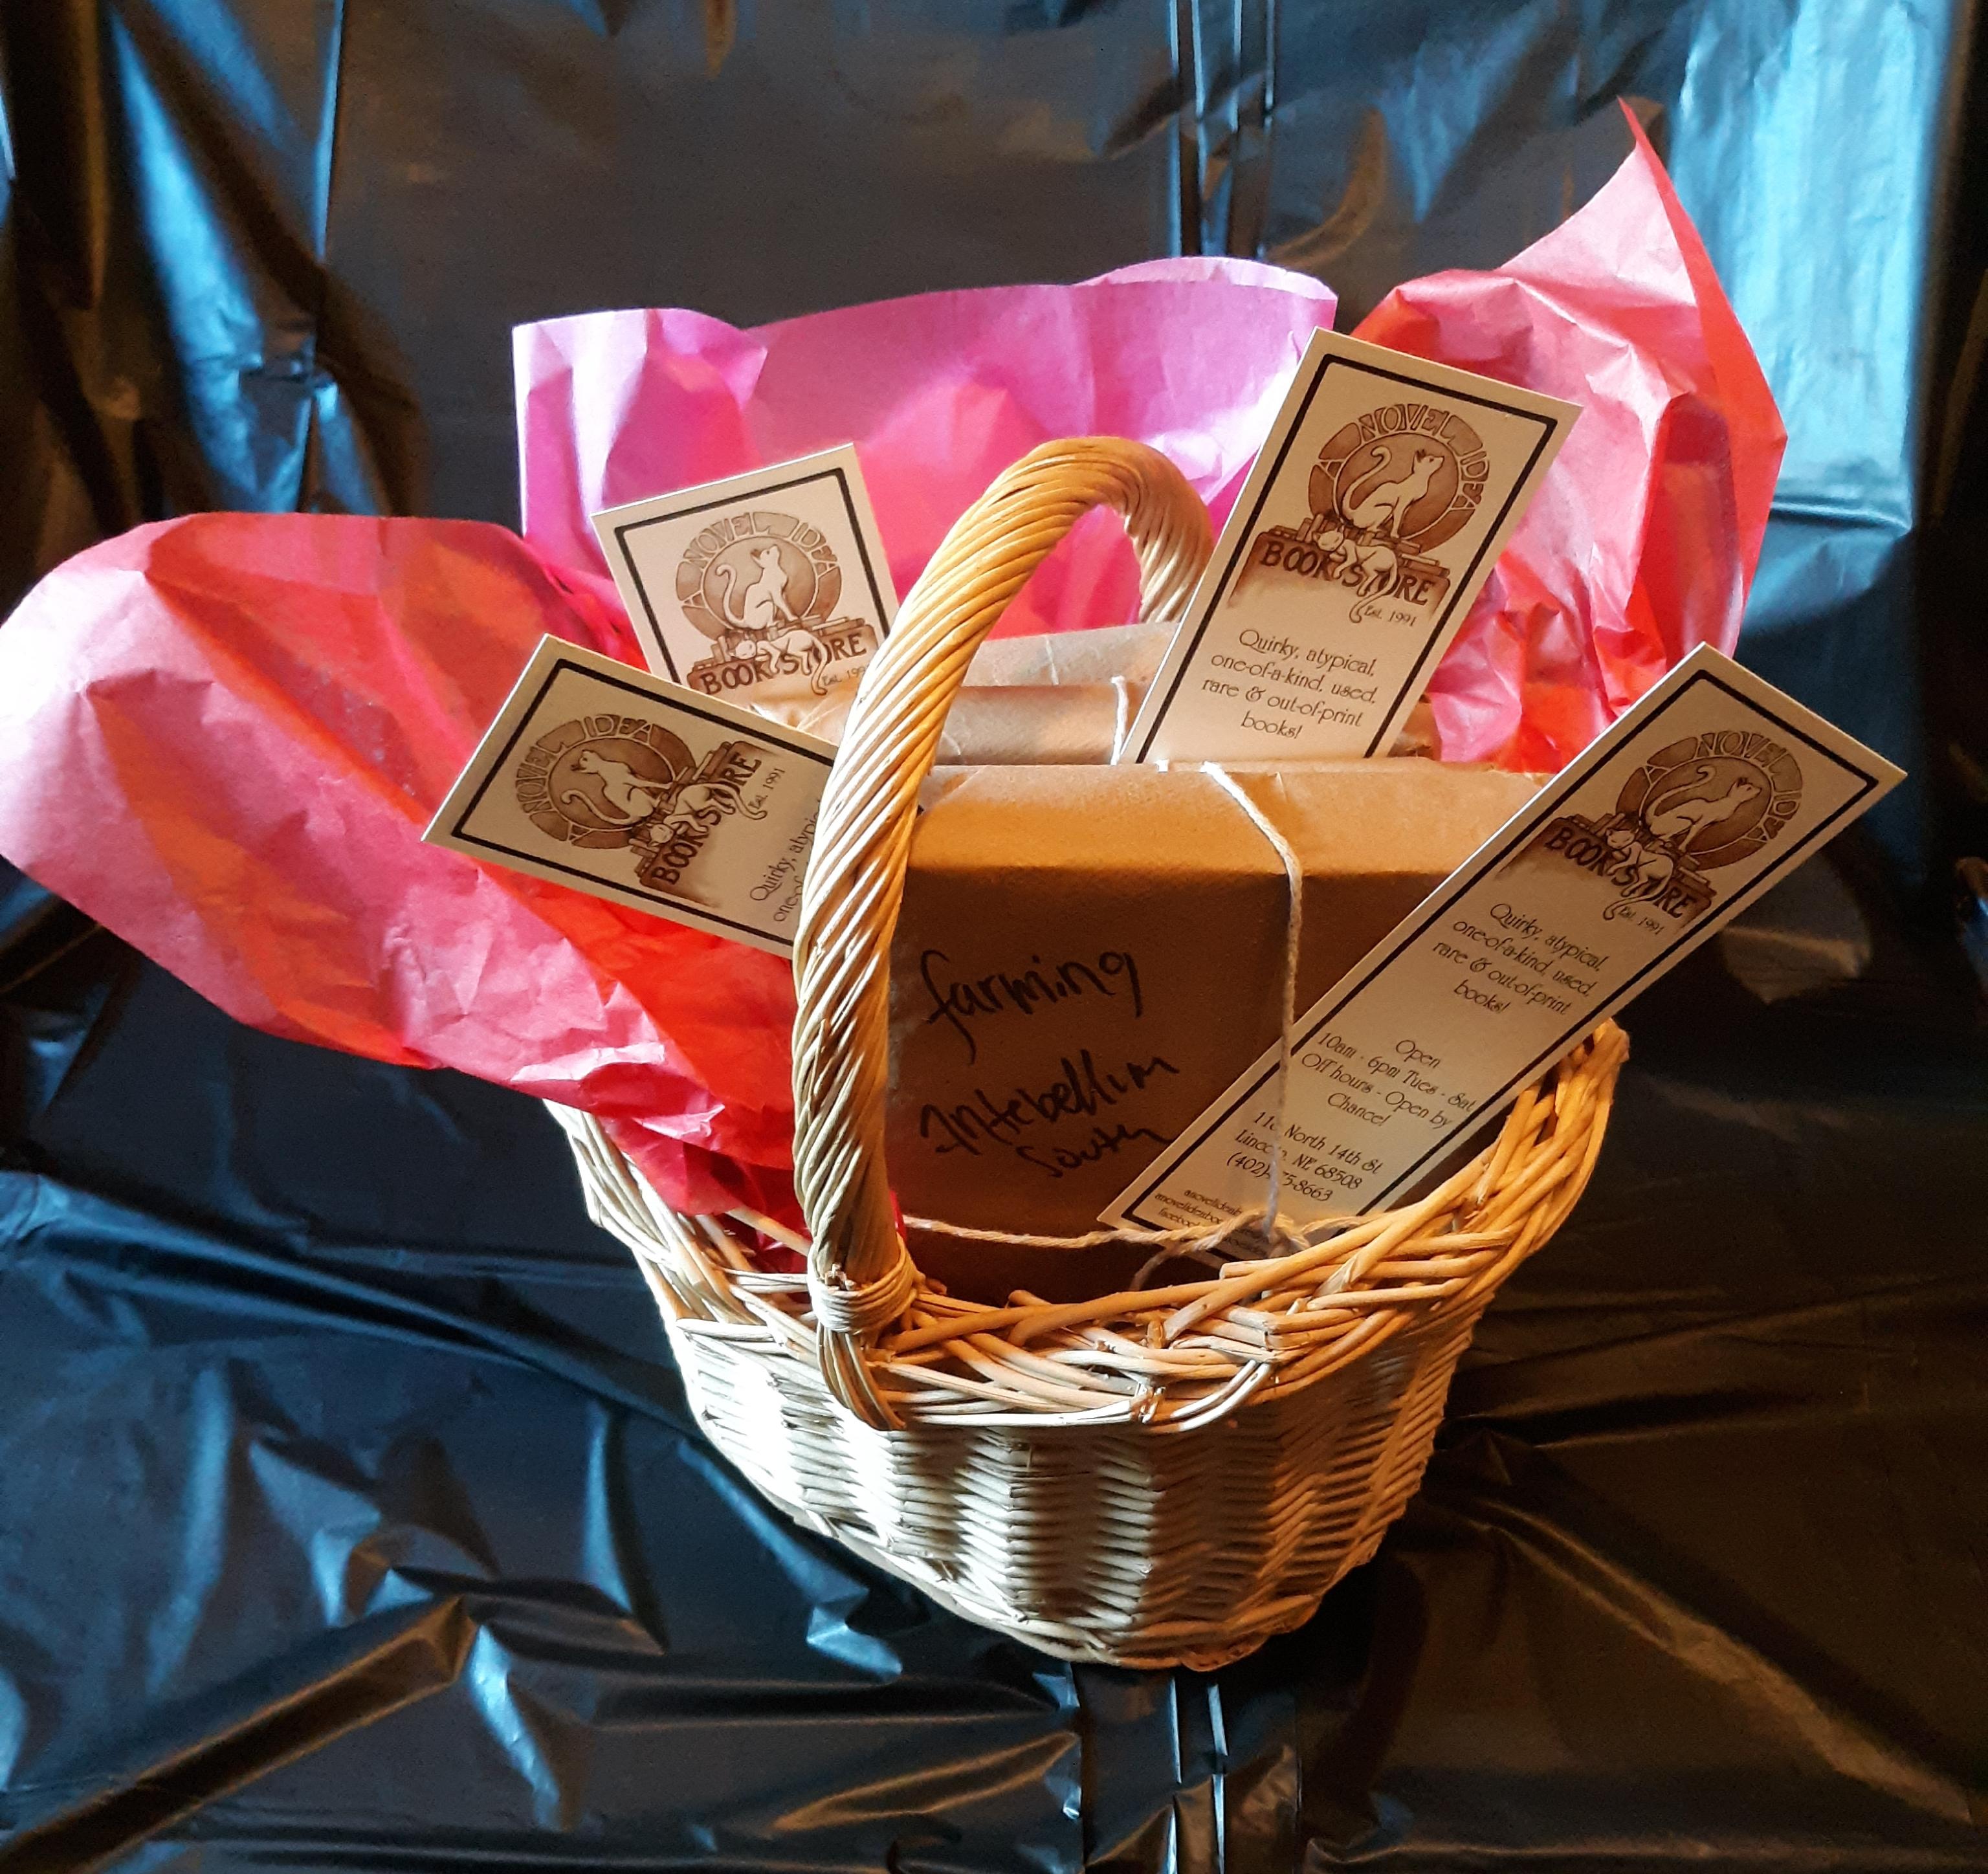 Basket #9 - Blind Date Books